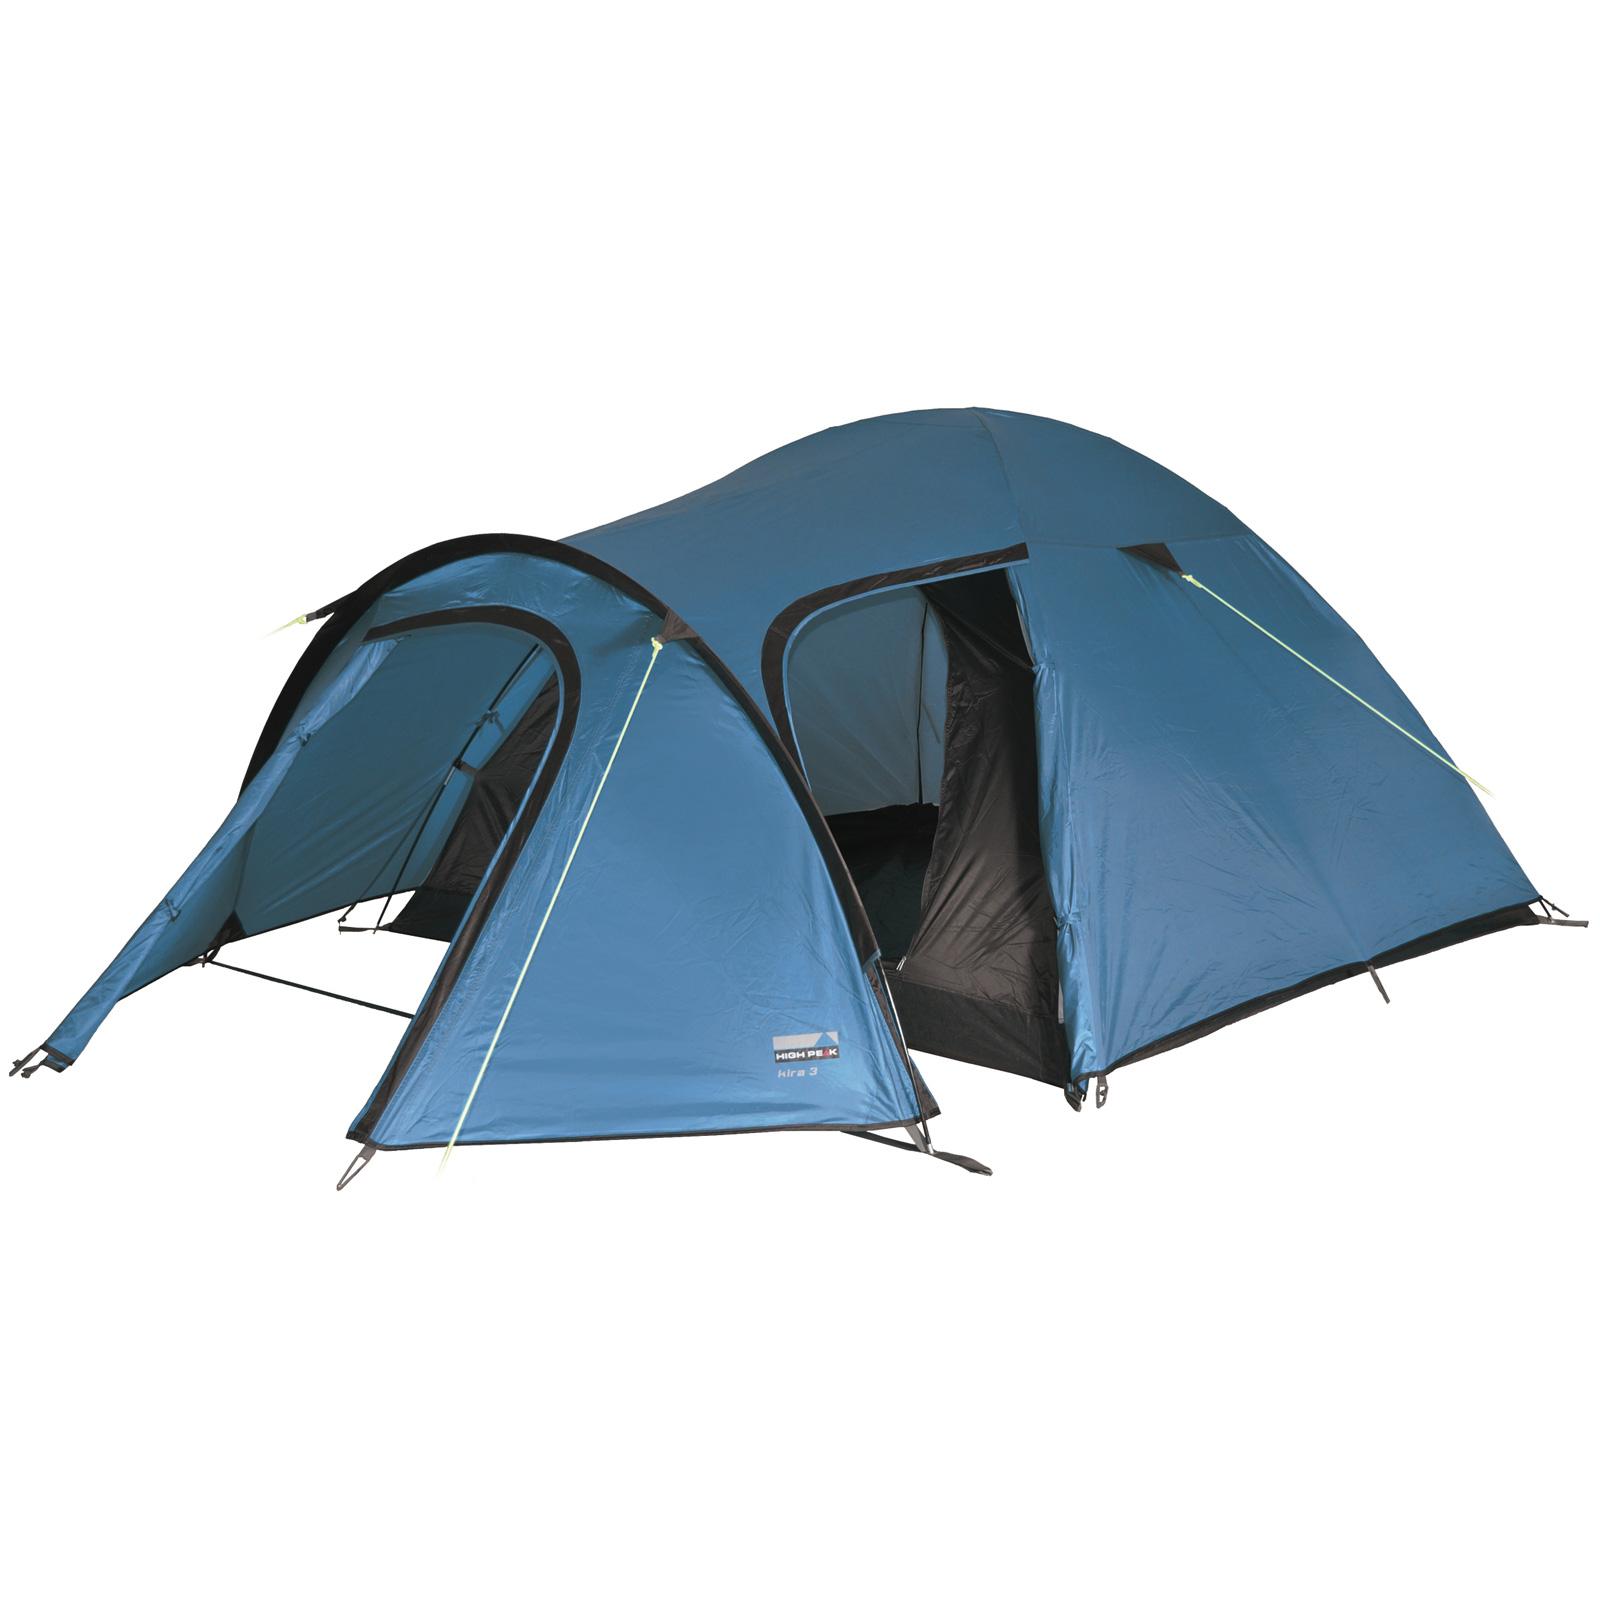 high peak kira 4 personen leichtes kuppelzelt iglu zelt neu ebay. Black Bedroom Furniture Sets. Home Design Ideas